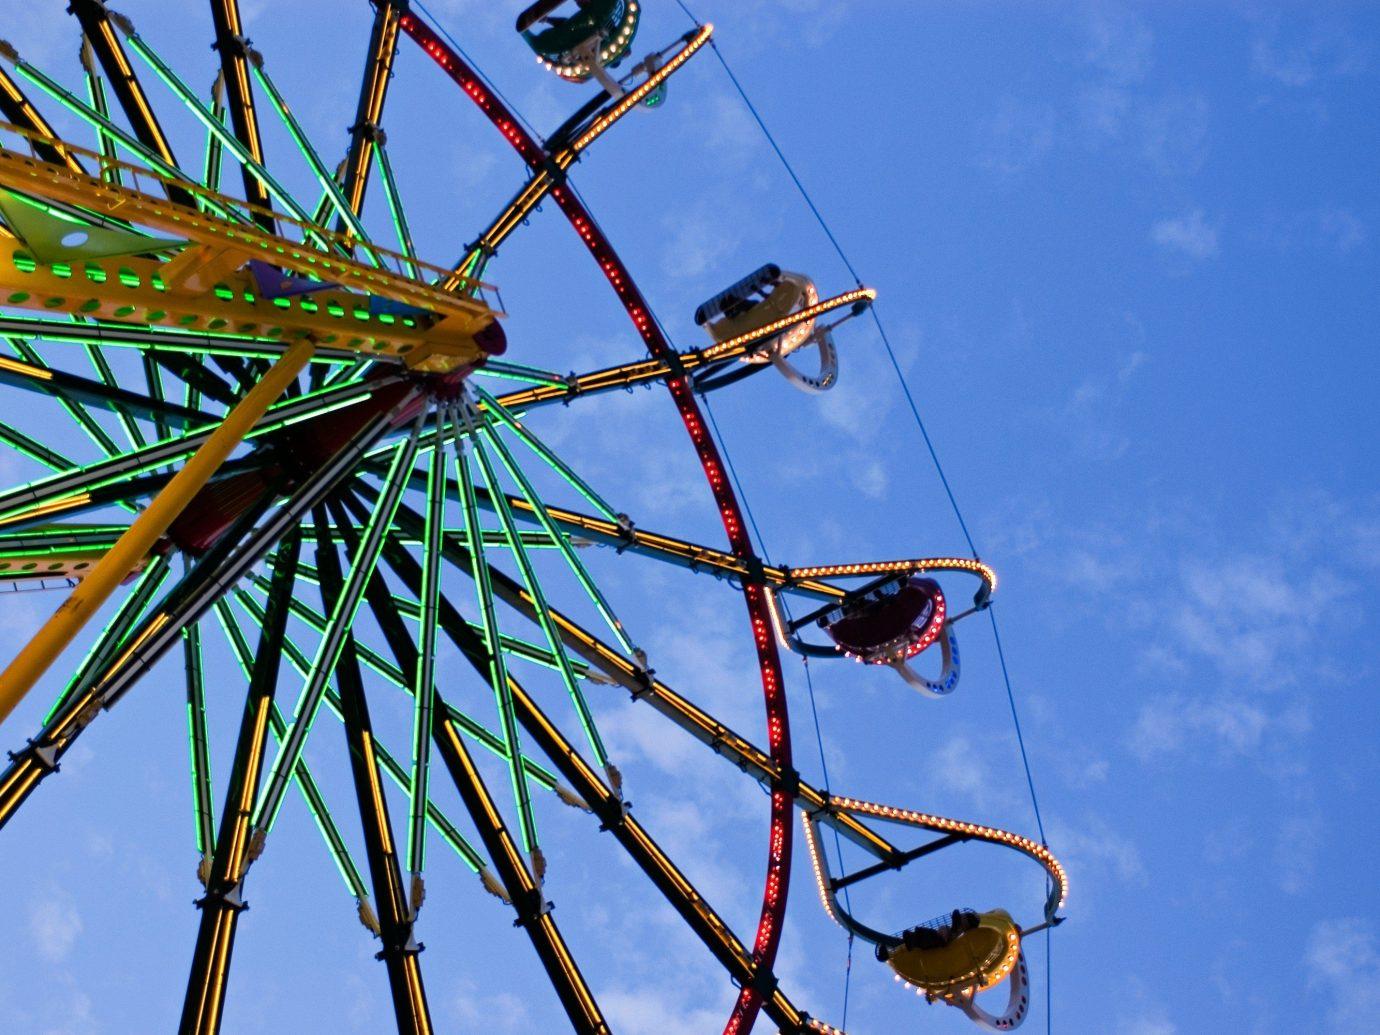 Offbeat sky outdoor blue ferris wheel tree ride plant outdoor object arecales flower mast amusement park roller coaster